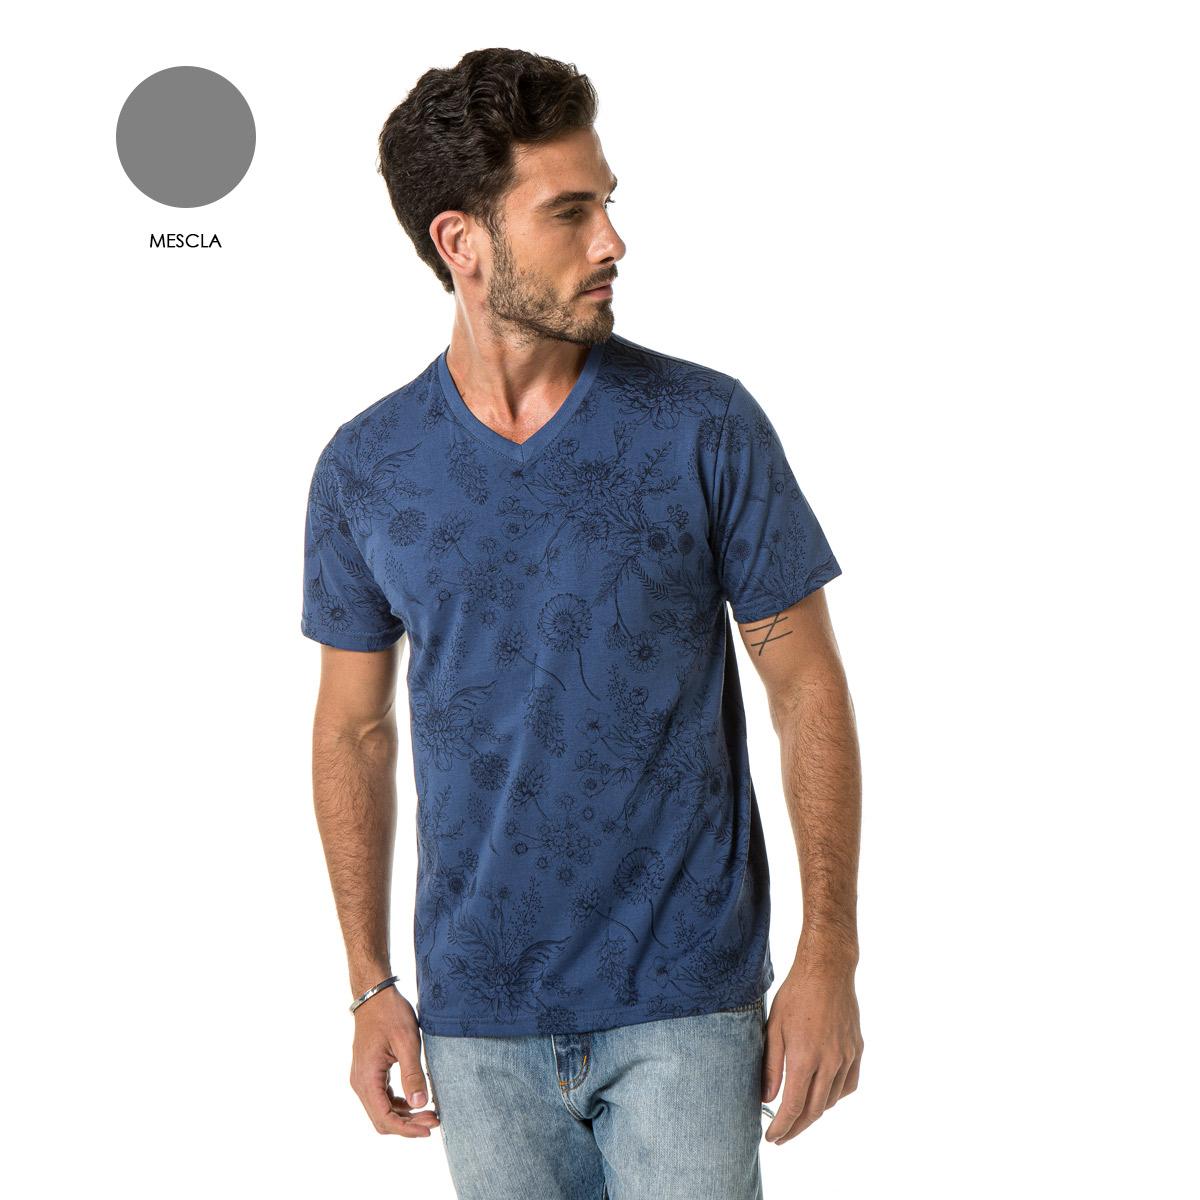 Camiseta Masculina Sba 20401